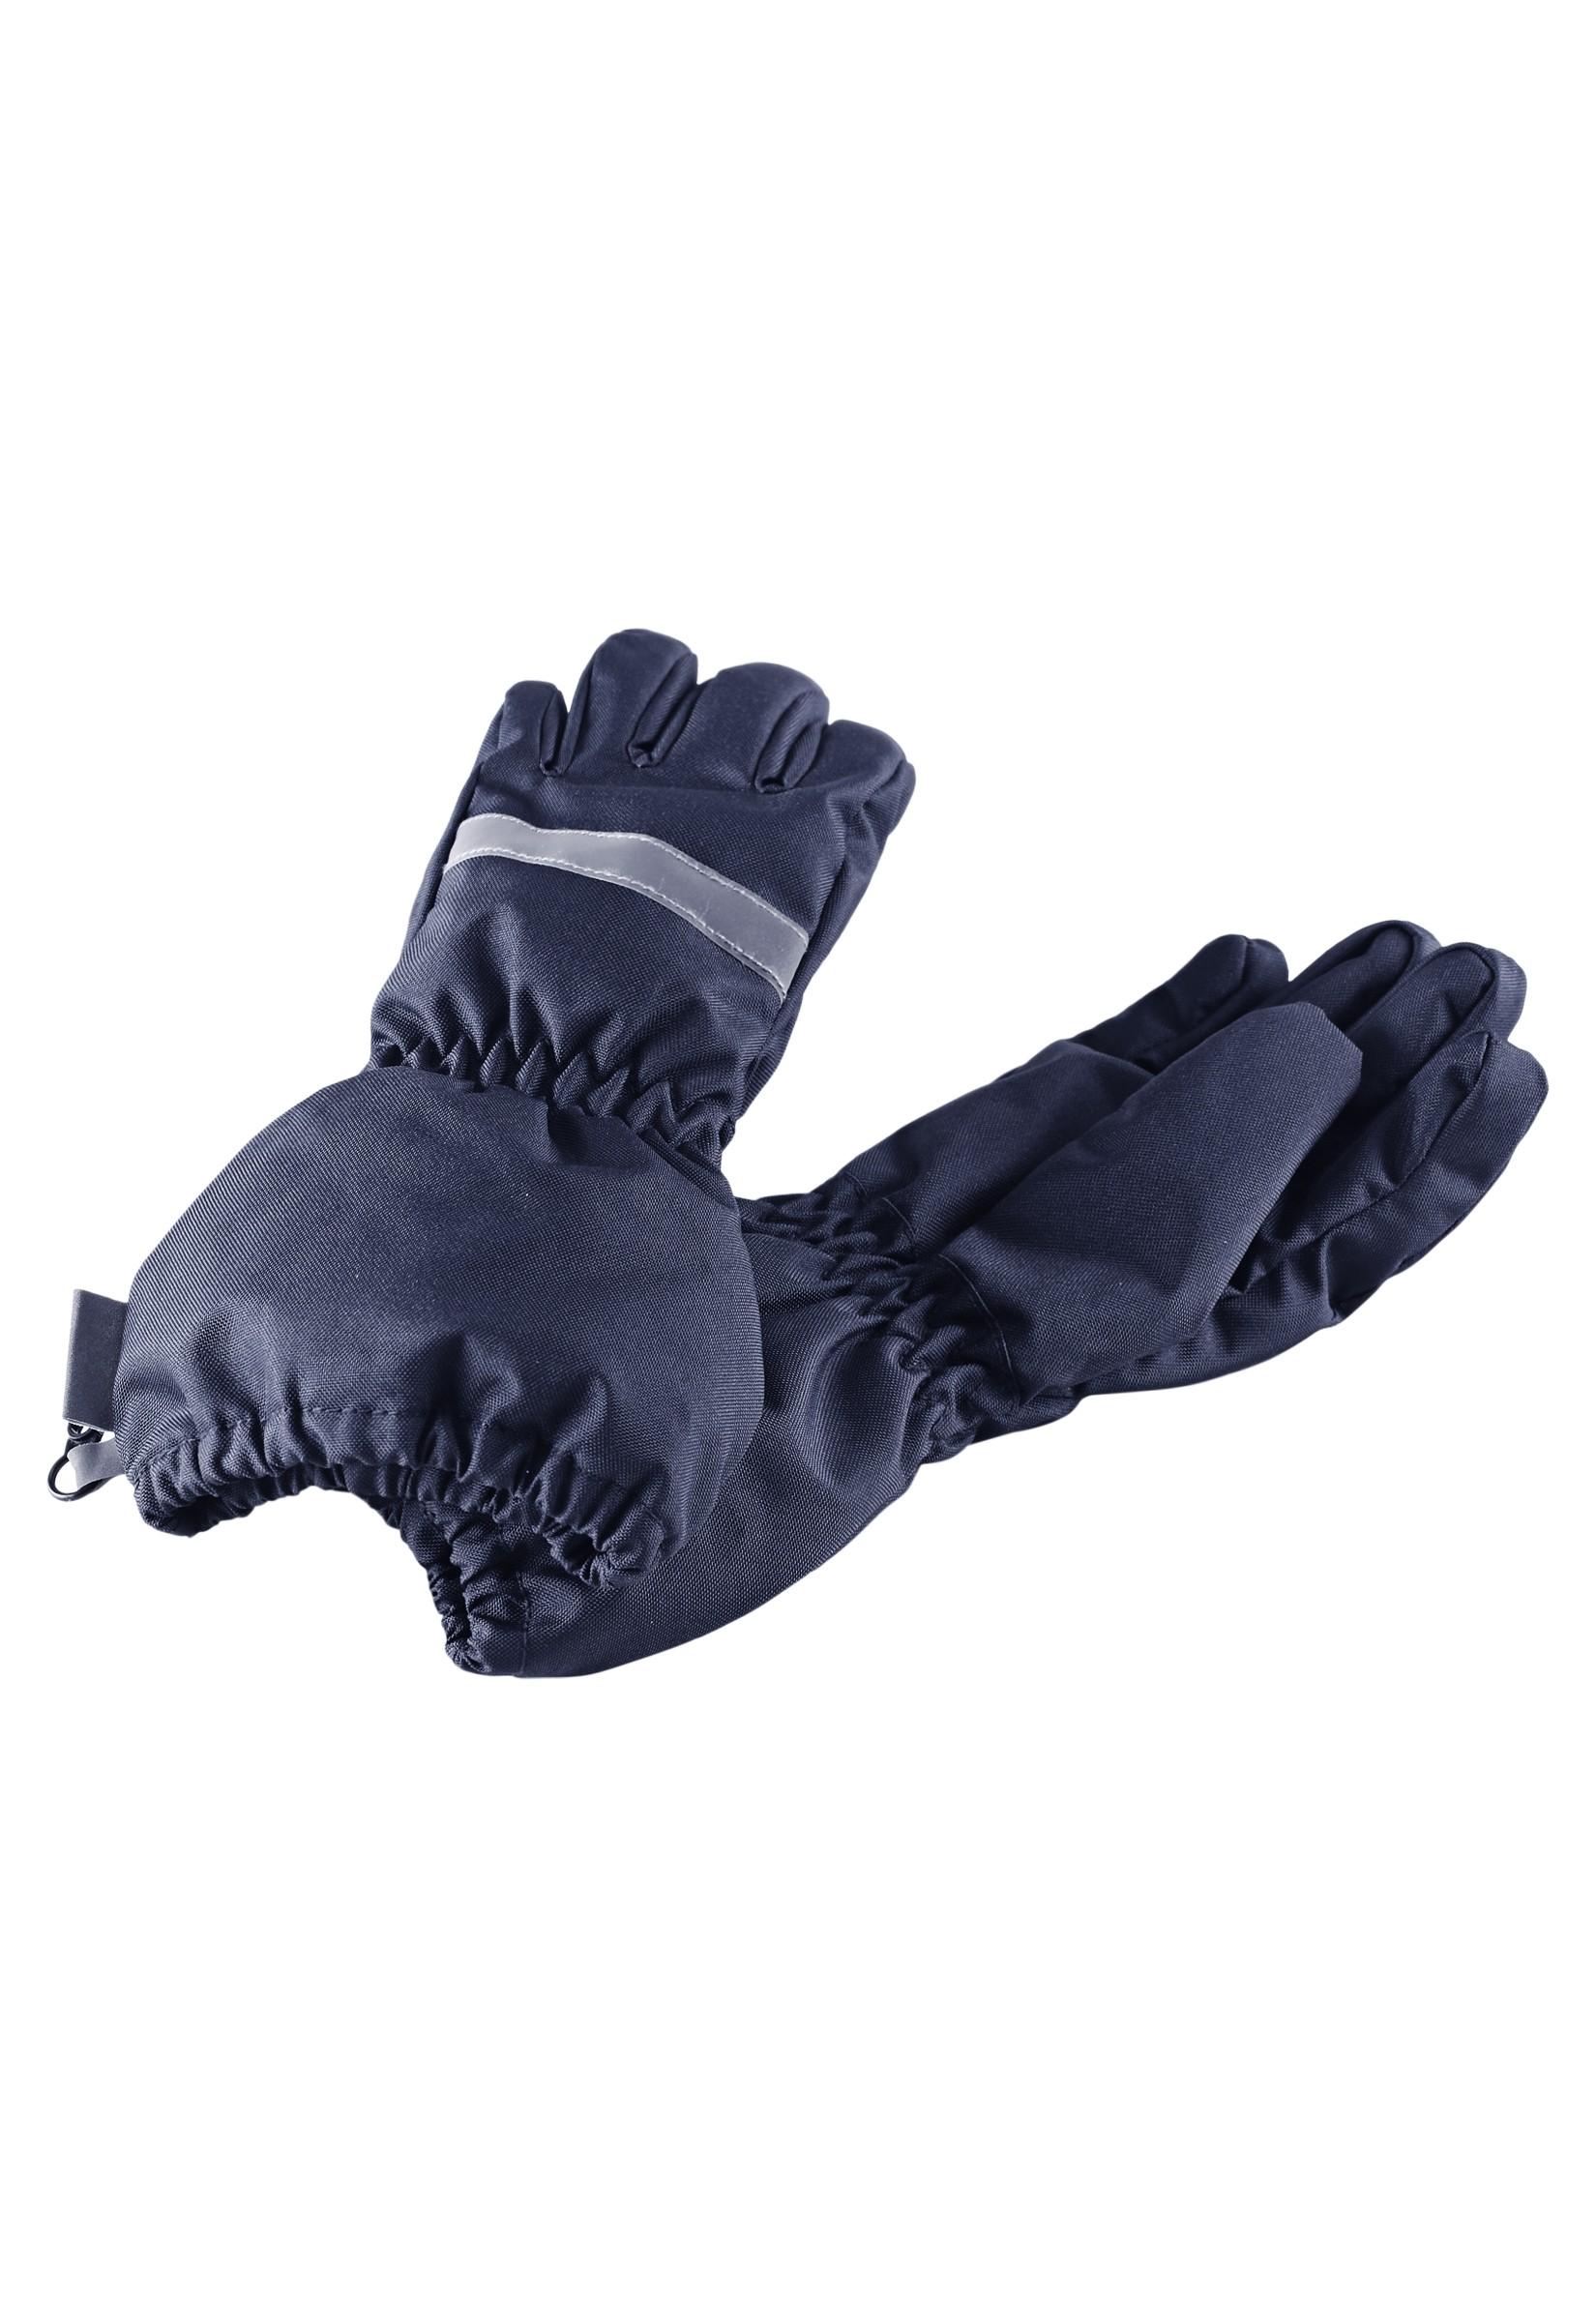 Варежки и перчатки Lassie Перчатки для мальчика Lassie, темно-синие перчатки kellys across синие xs